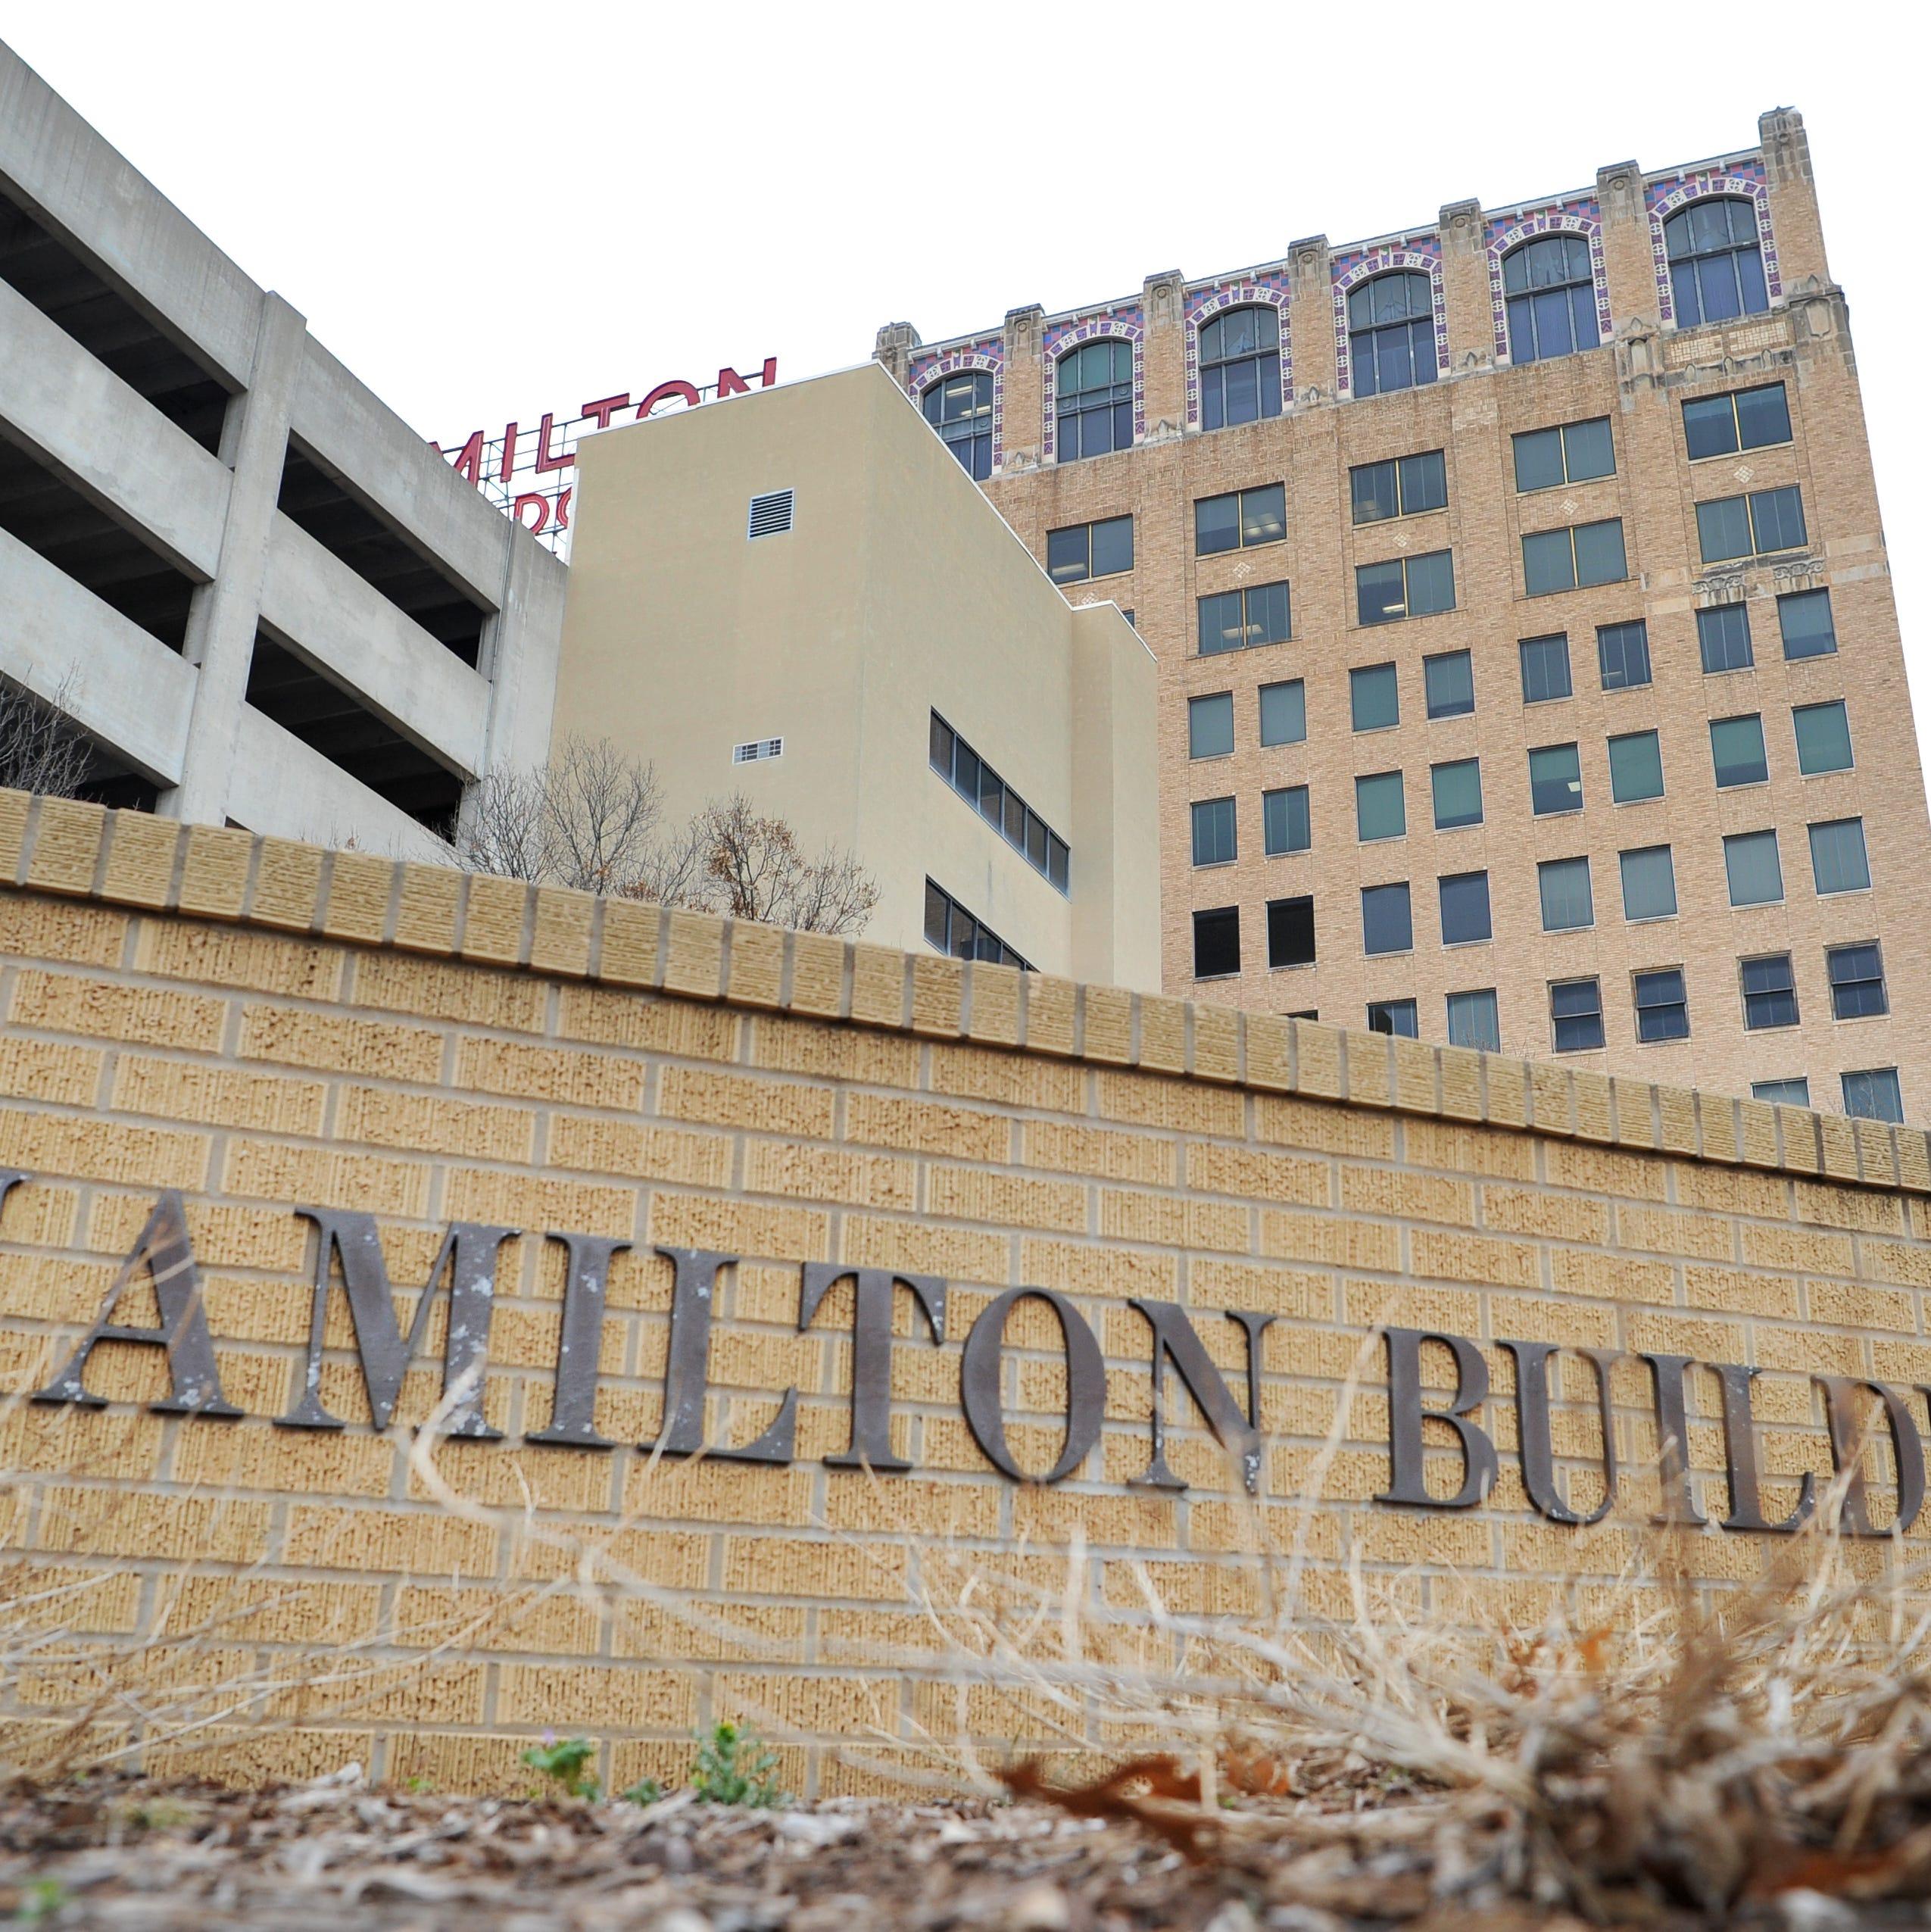 Hamilton Building welcomes new tenant to downtown Wichita Falls landmark